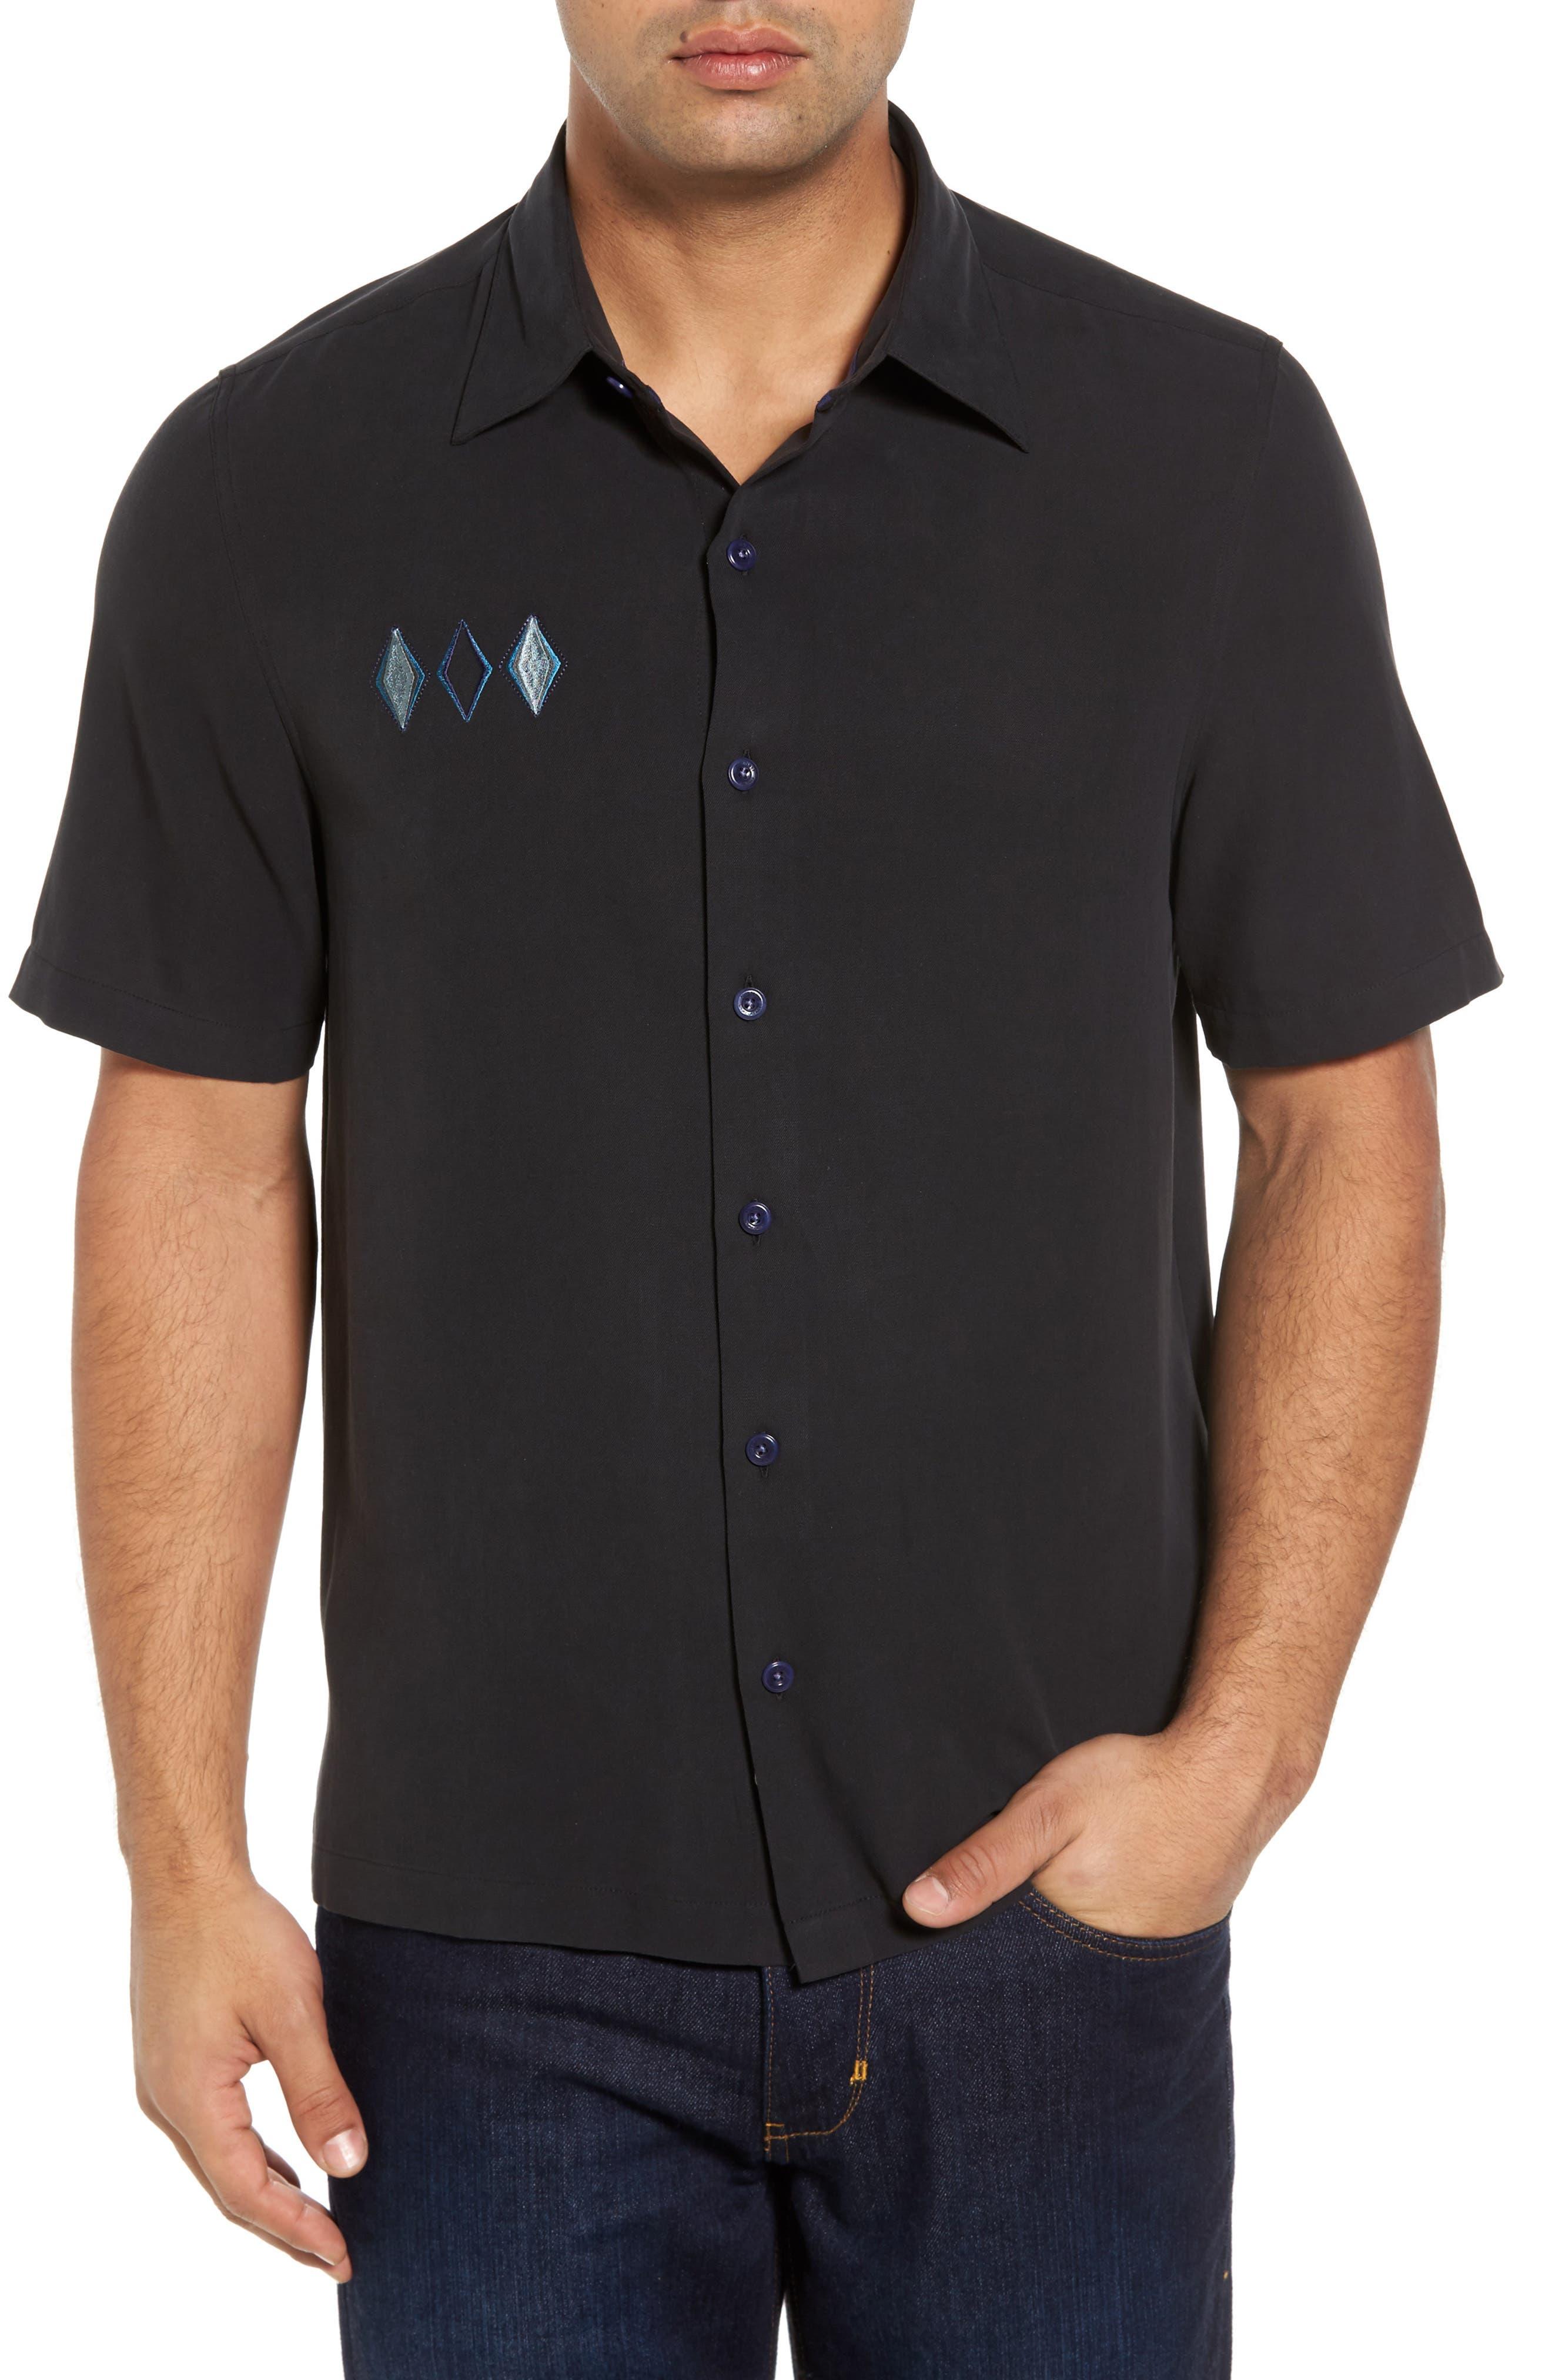 Alternate Image 1 Selected - Nat Nast Black Diamond Regular Fit Embroidered Silk Blend Sport Shirt